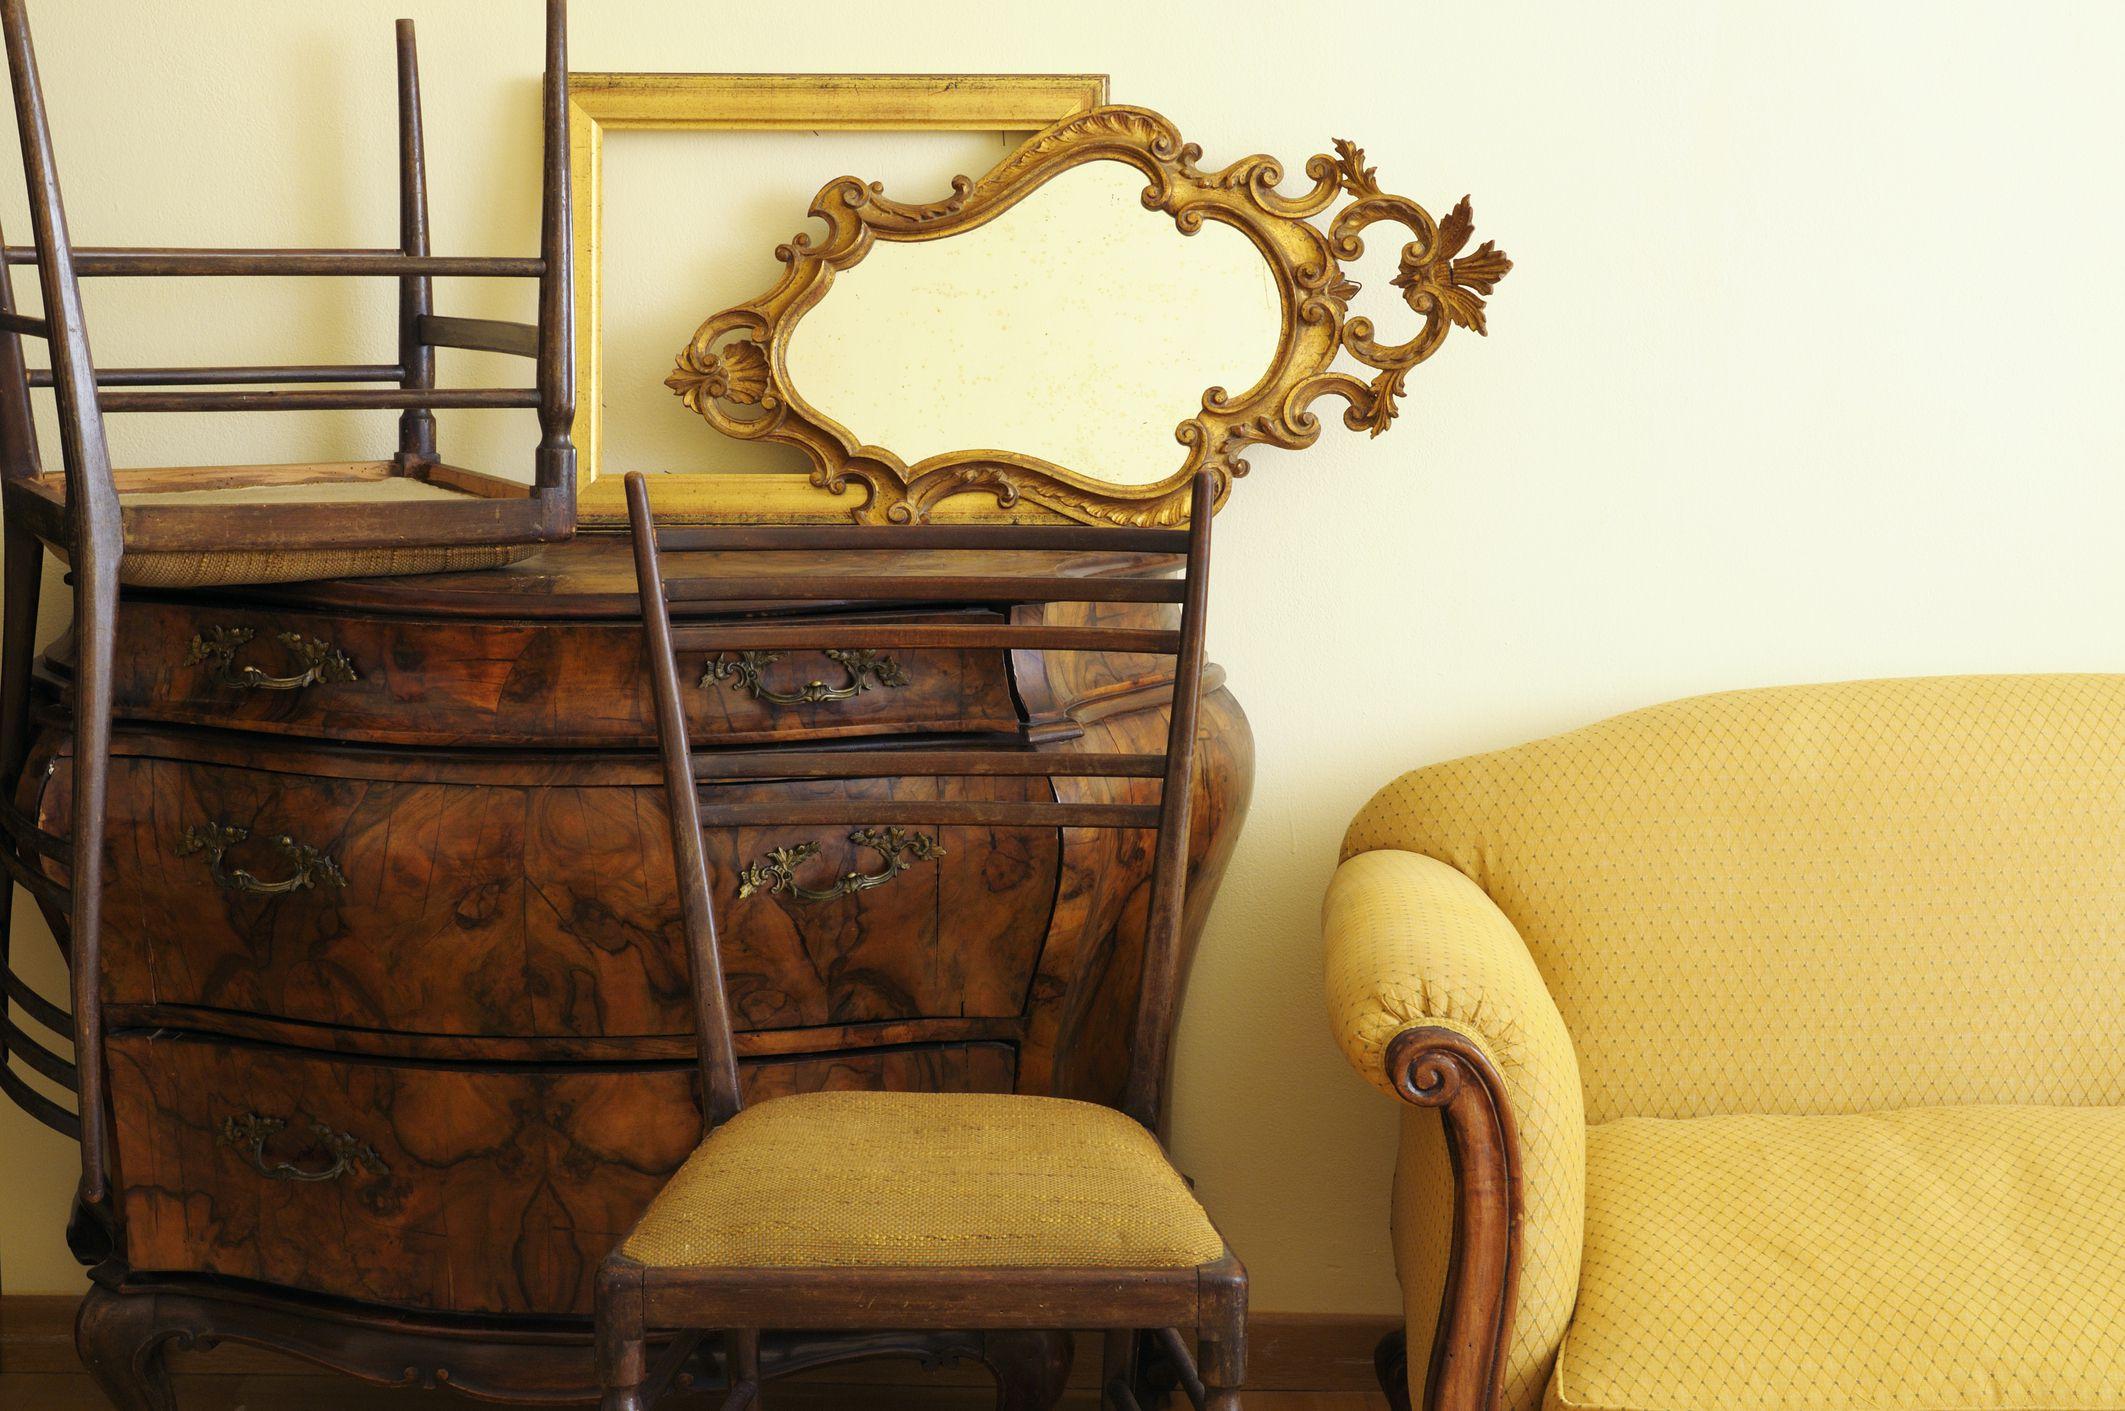 10 consejos para vender tus muebles usados for Se vende muebles usados